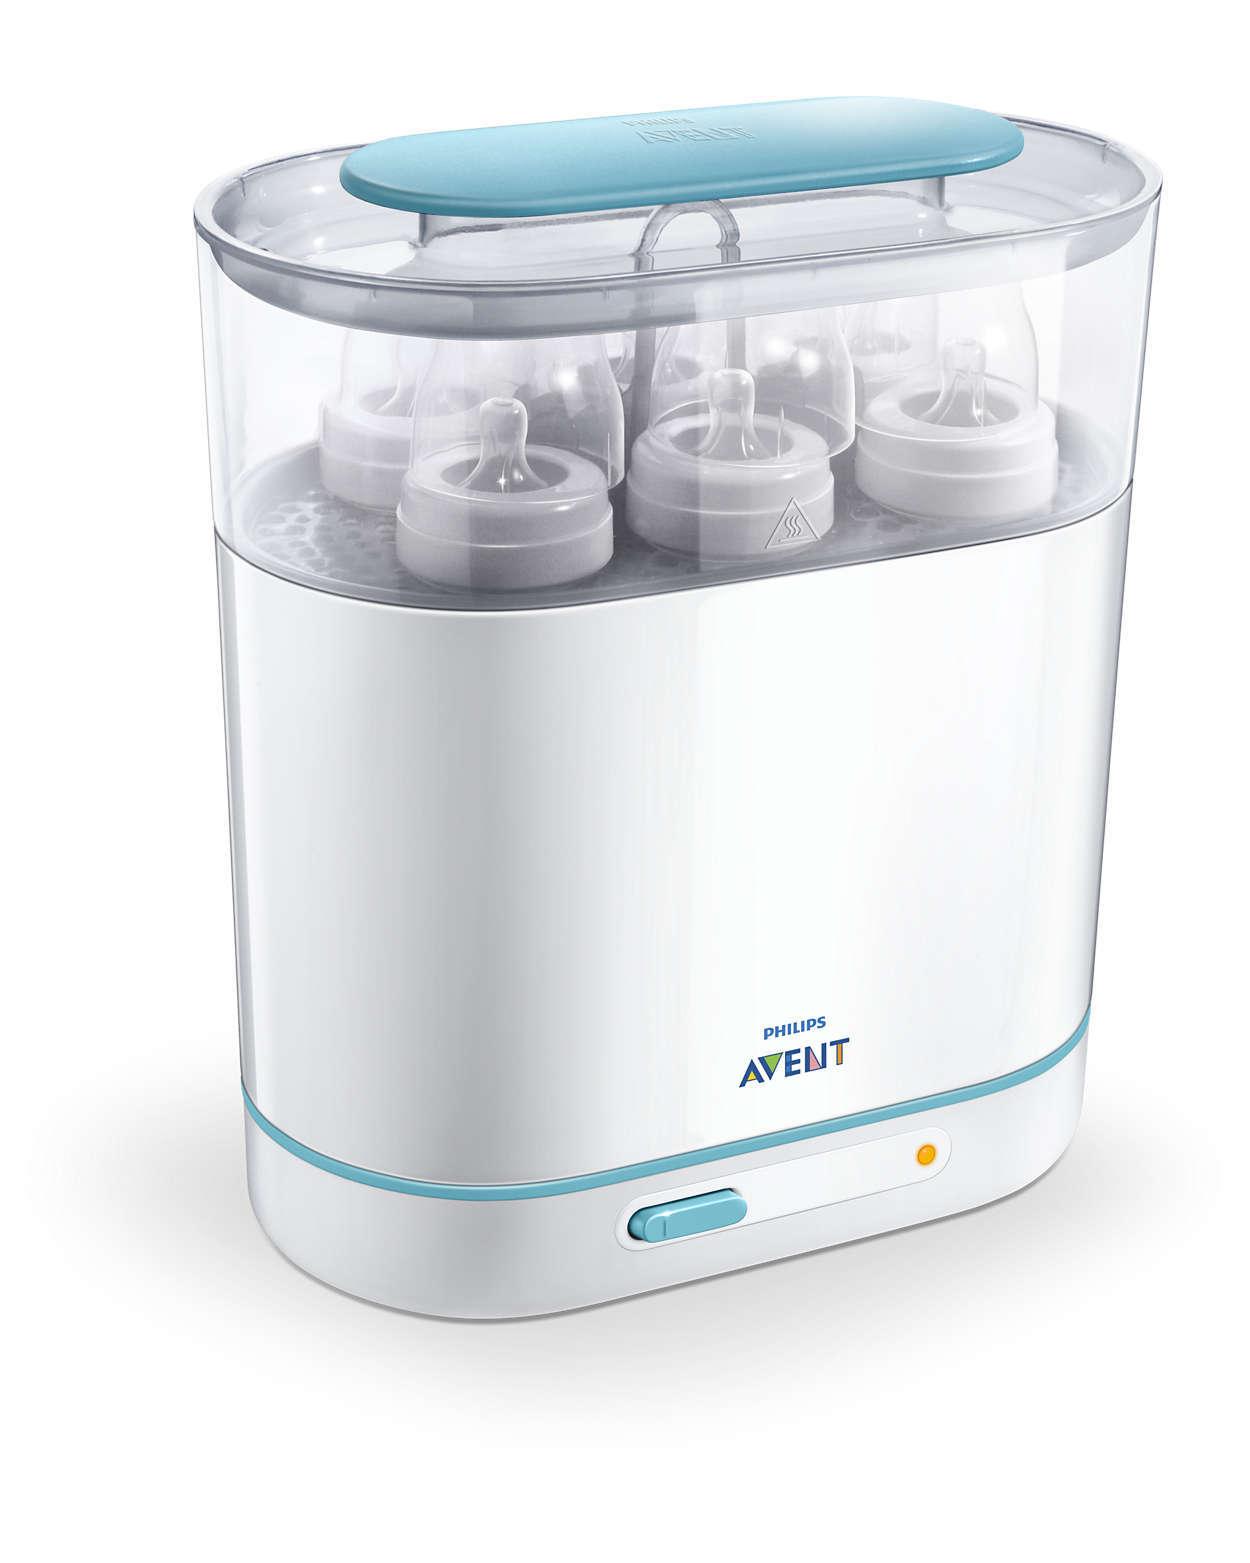 Philips Avent 3 in 1 Electric Steam Steriliser image